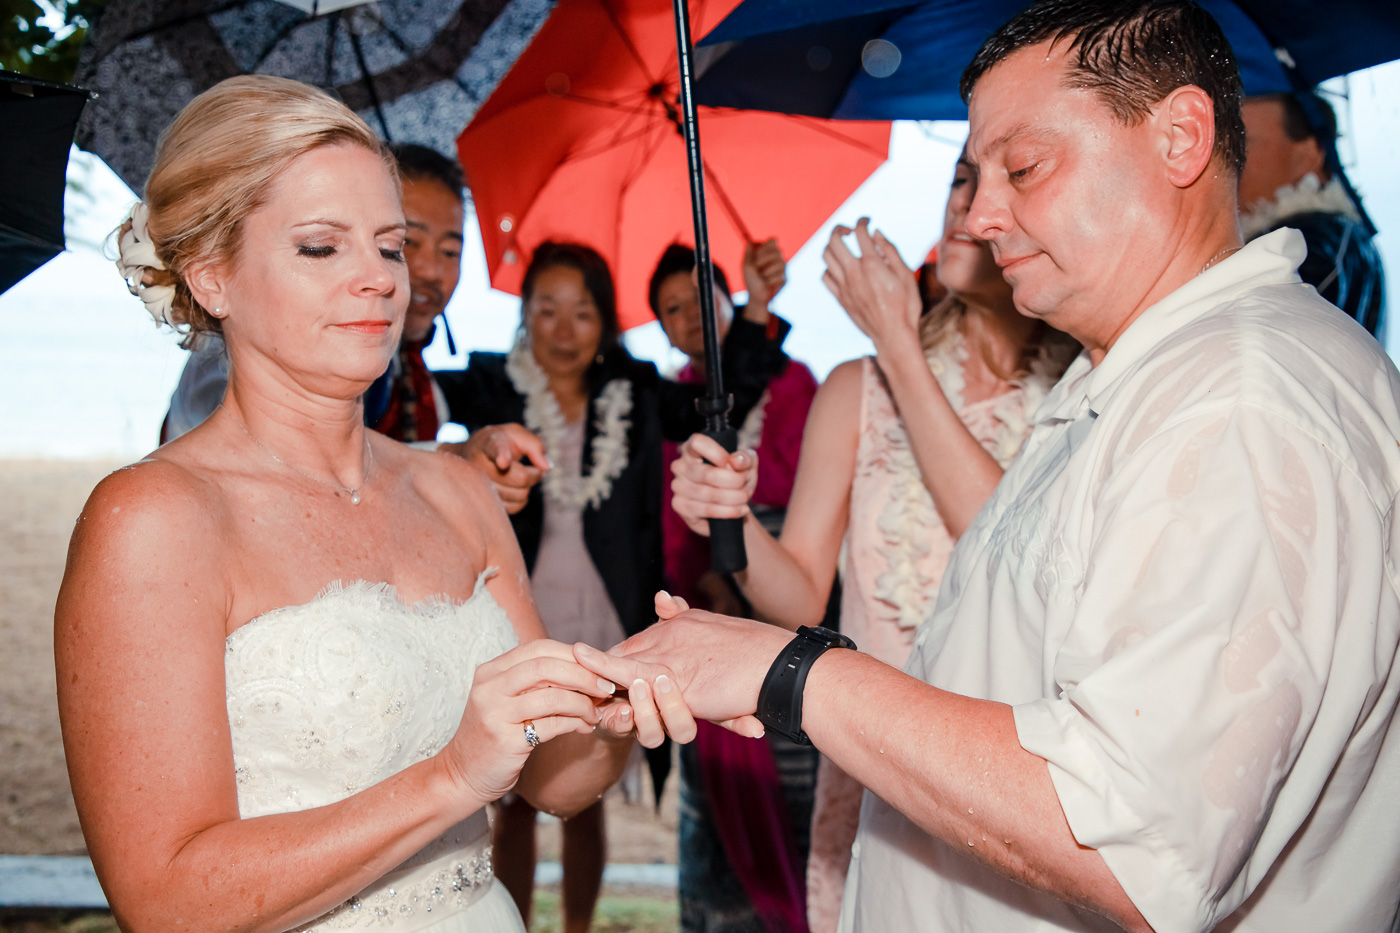 wedding-redux-41018.jpg